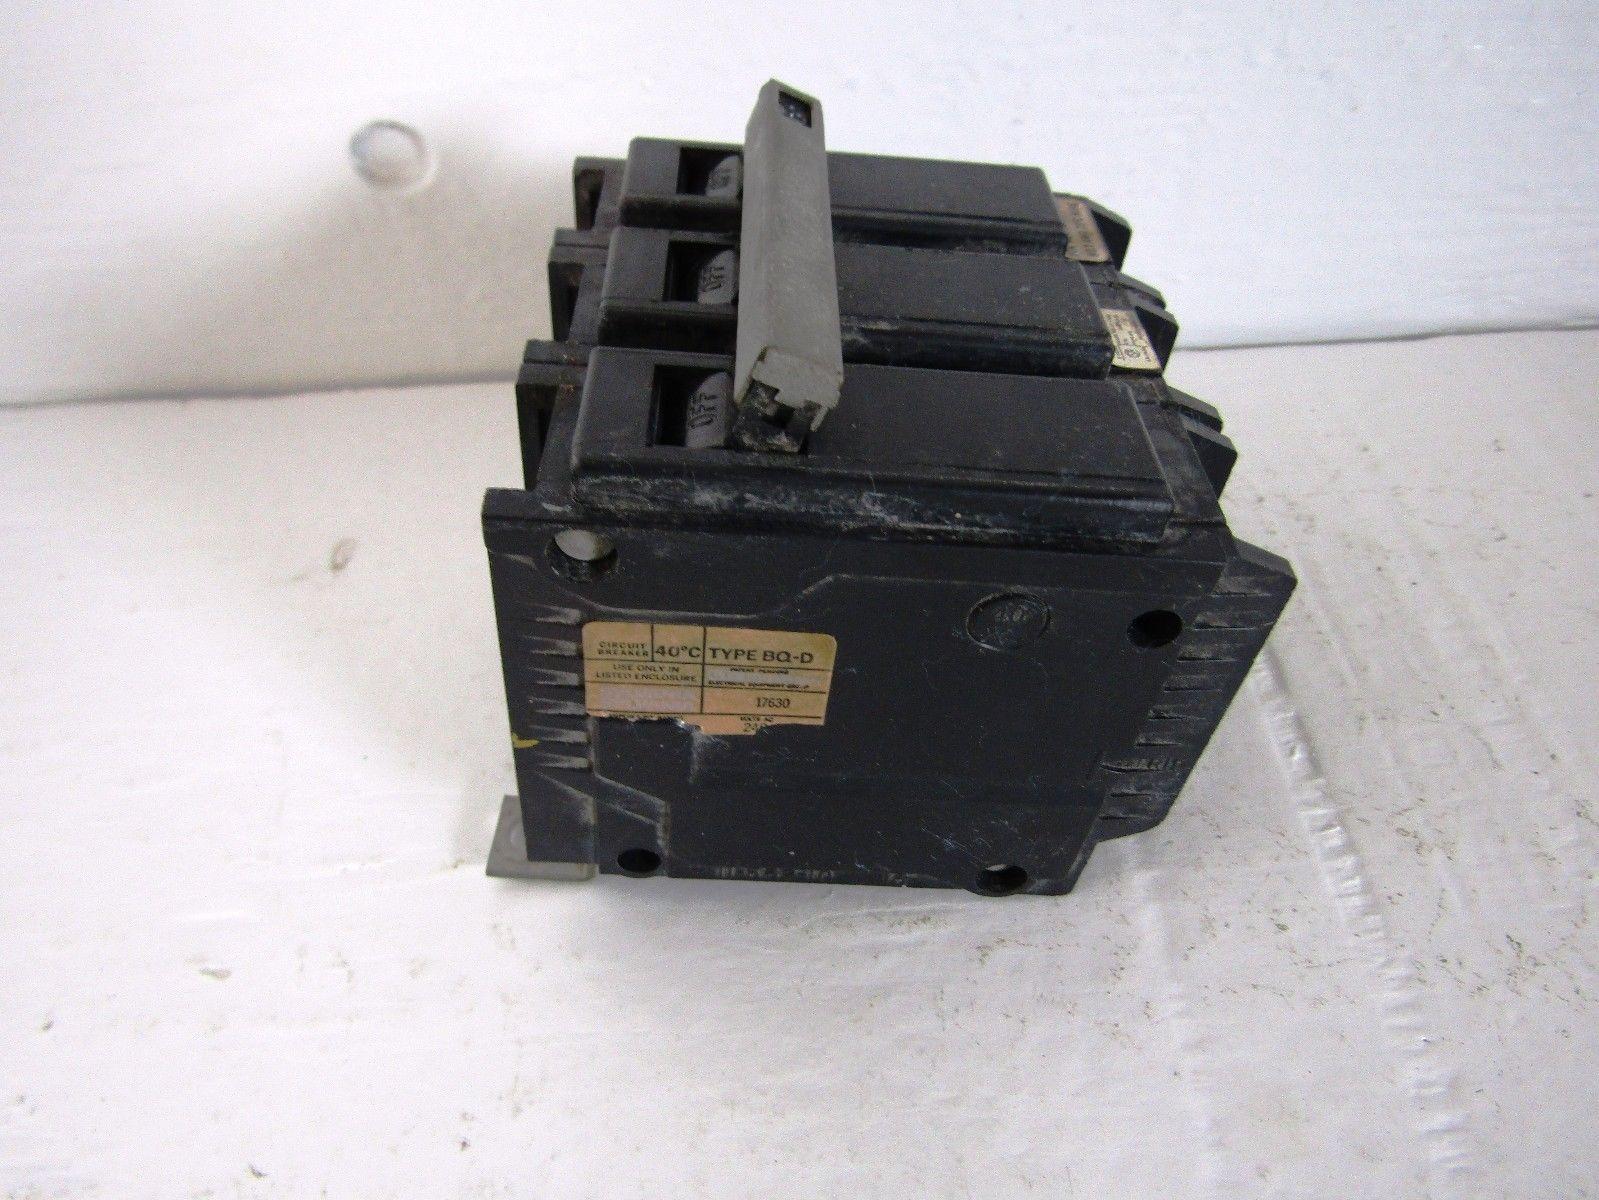 Zinsco Gte Sylvania Bq3 D100 3 Pole 100 Amp 240 Volt Circuit Breaker Fuse Box